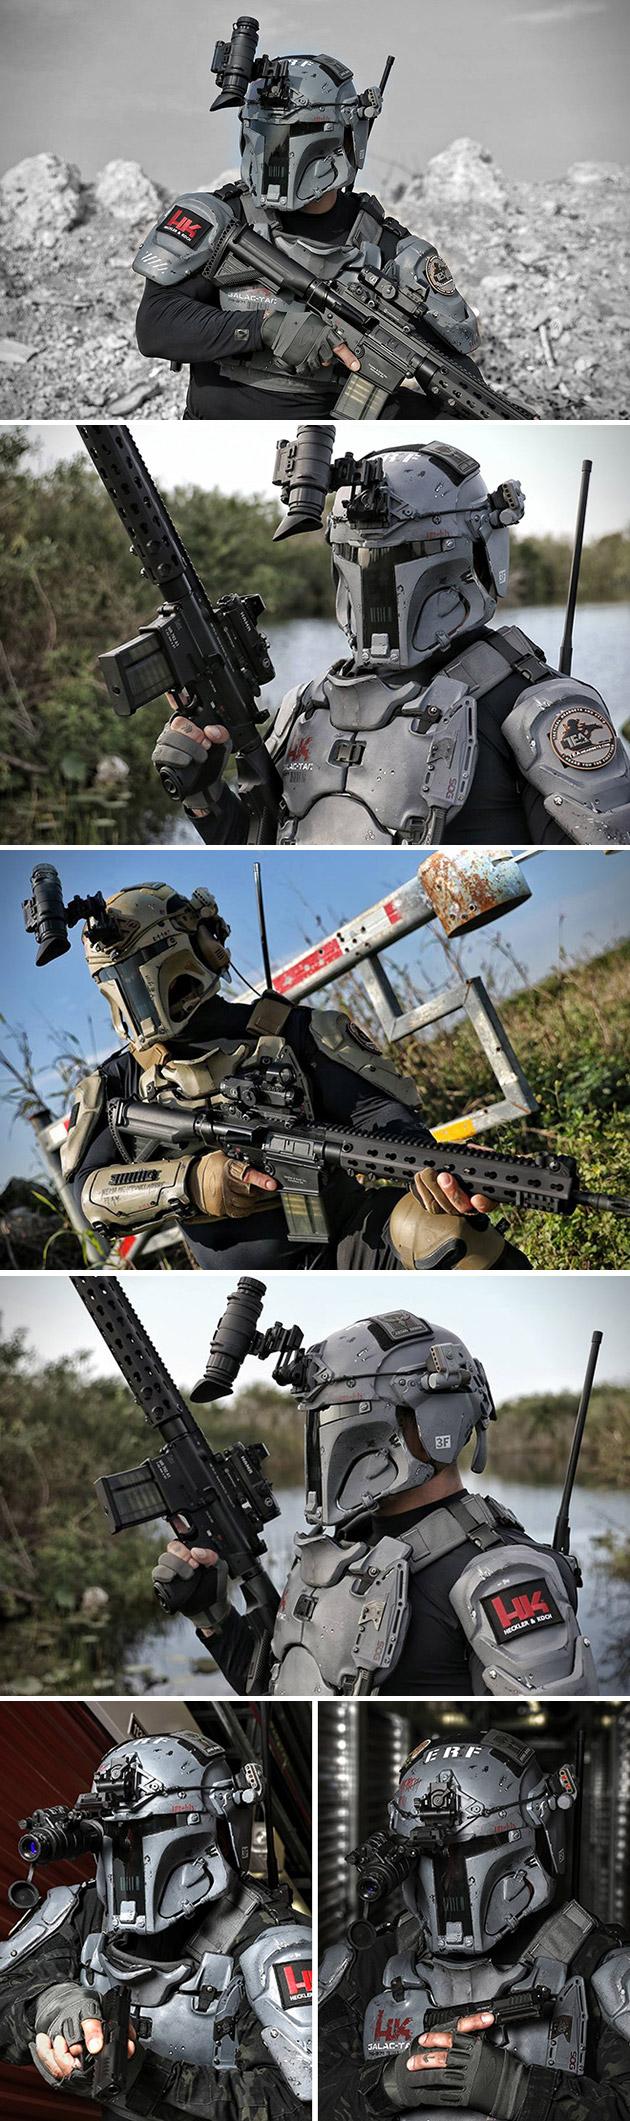 H&K GalacTac Project. Boba-fett-armor